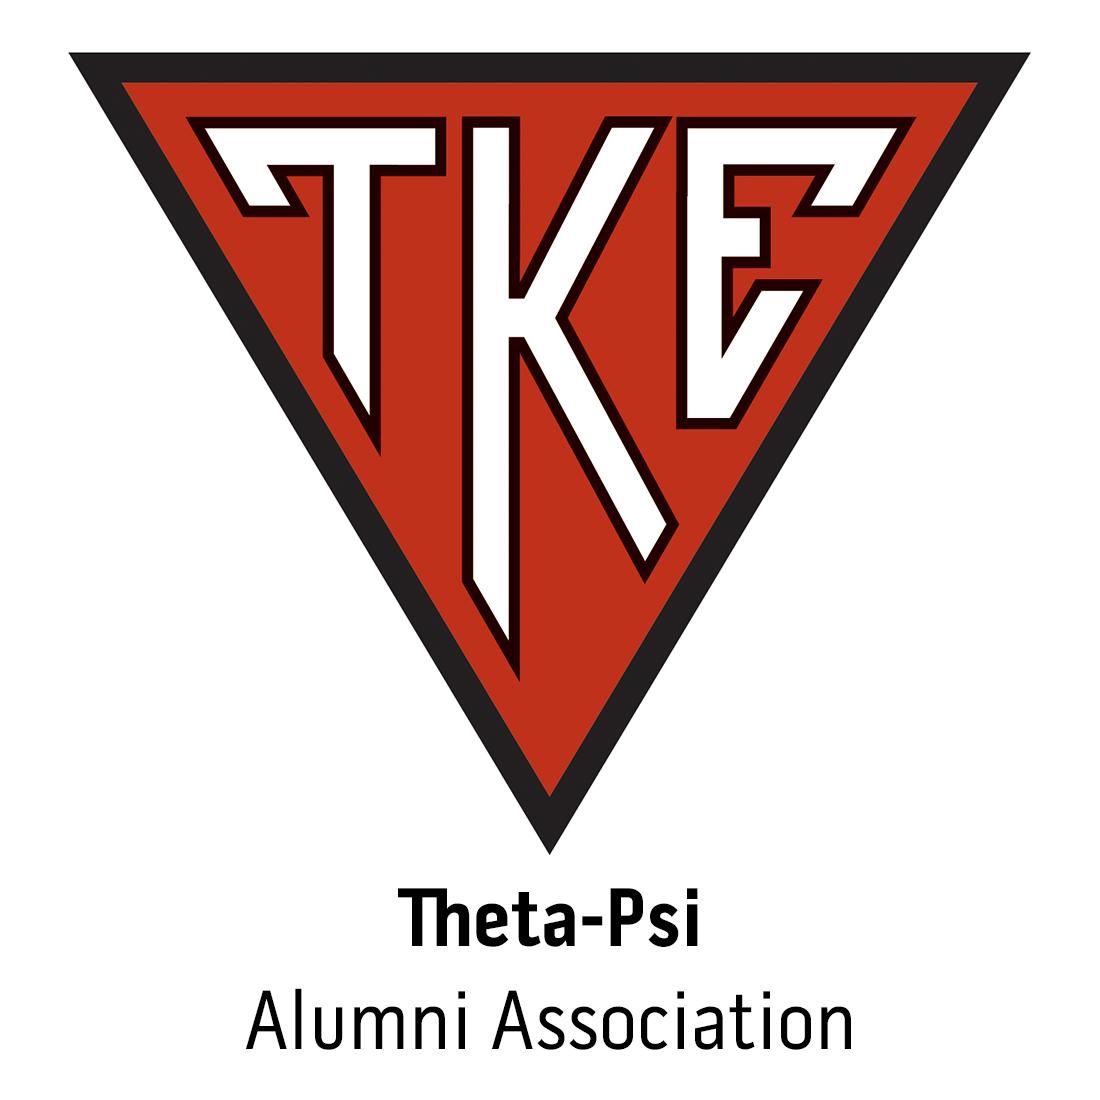 Theta-Psi Alumni Association for Ferris State University